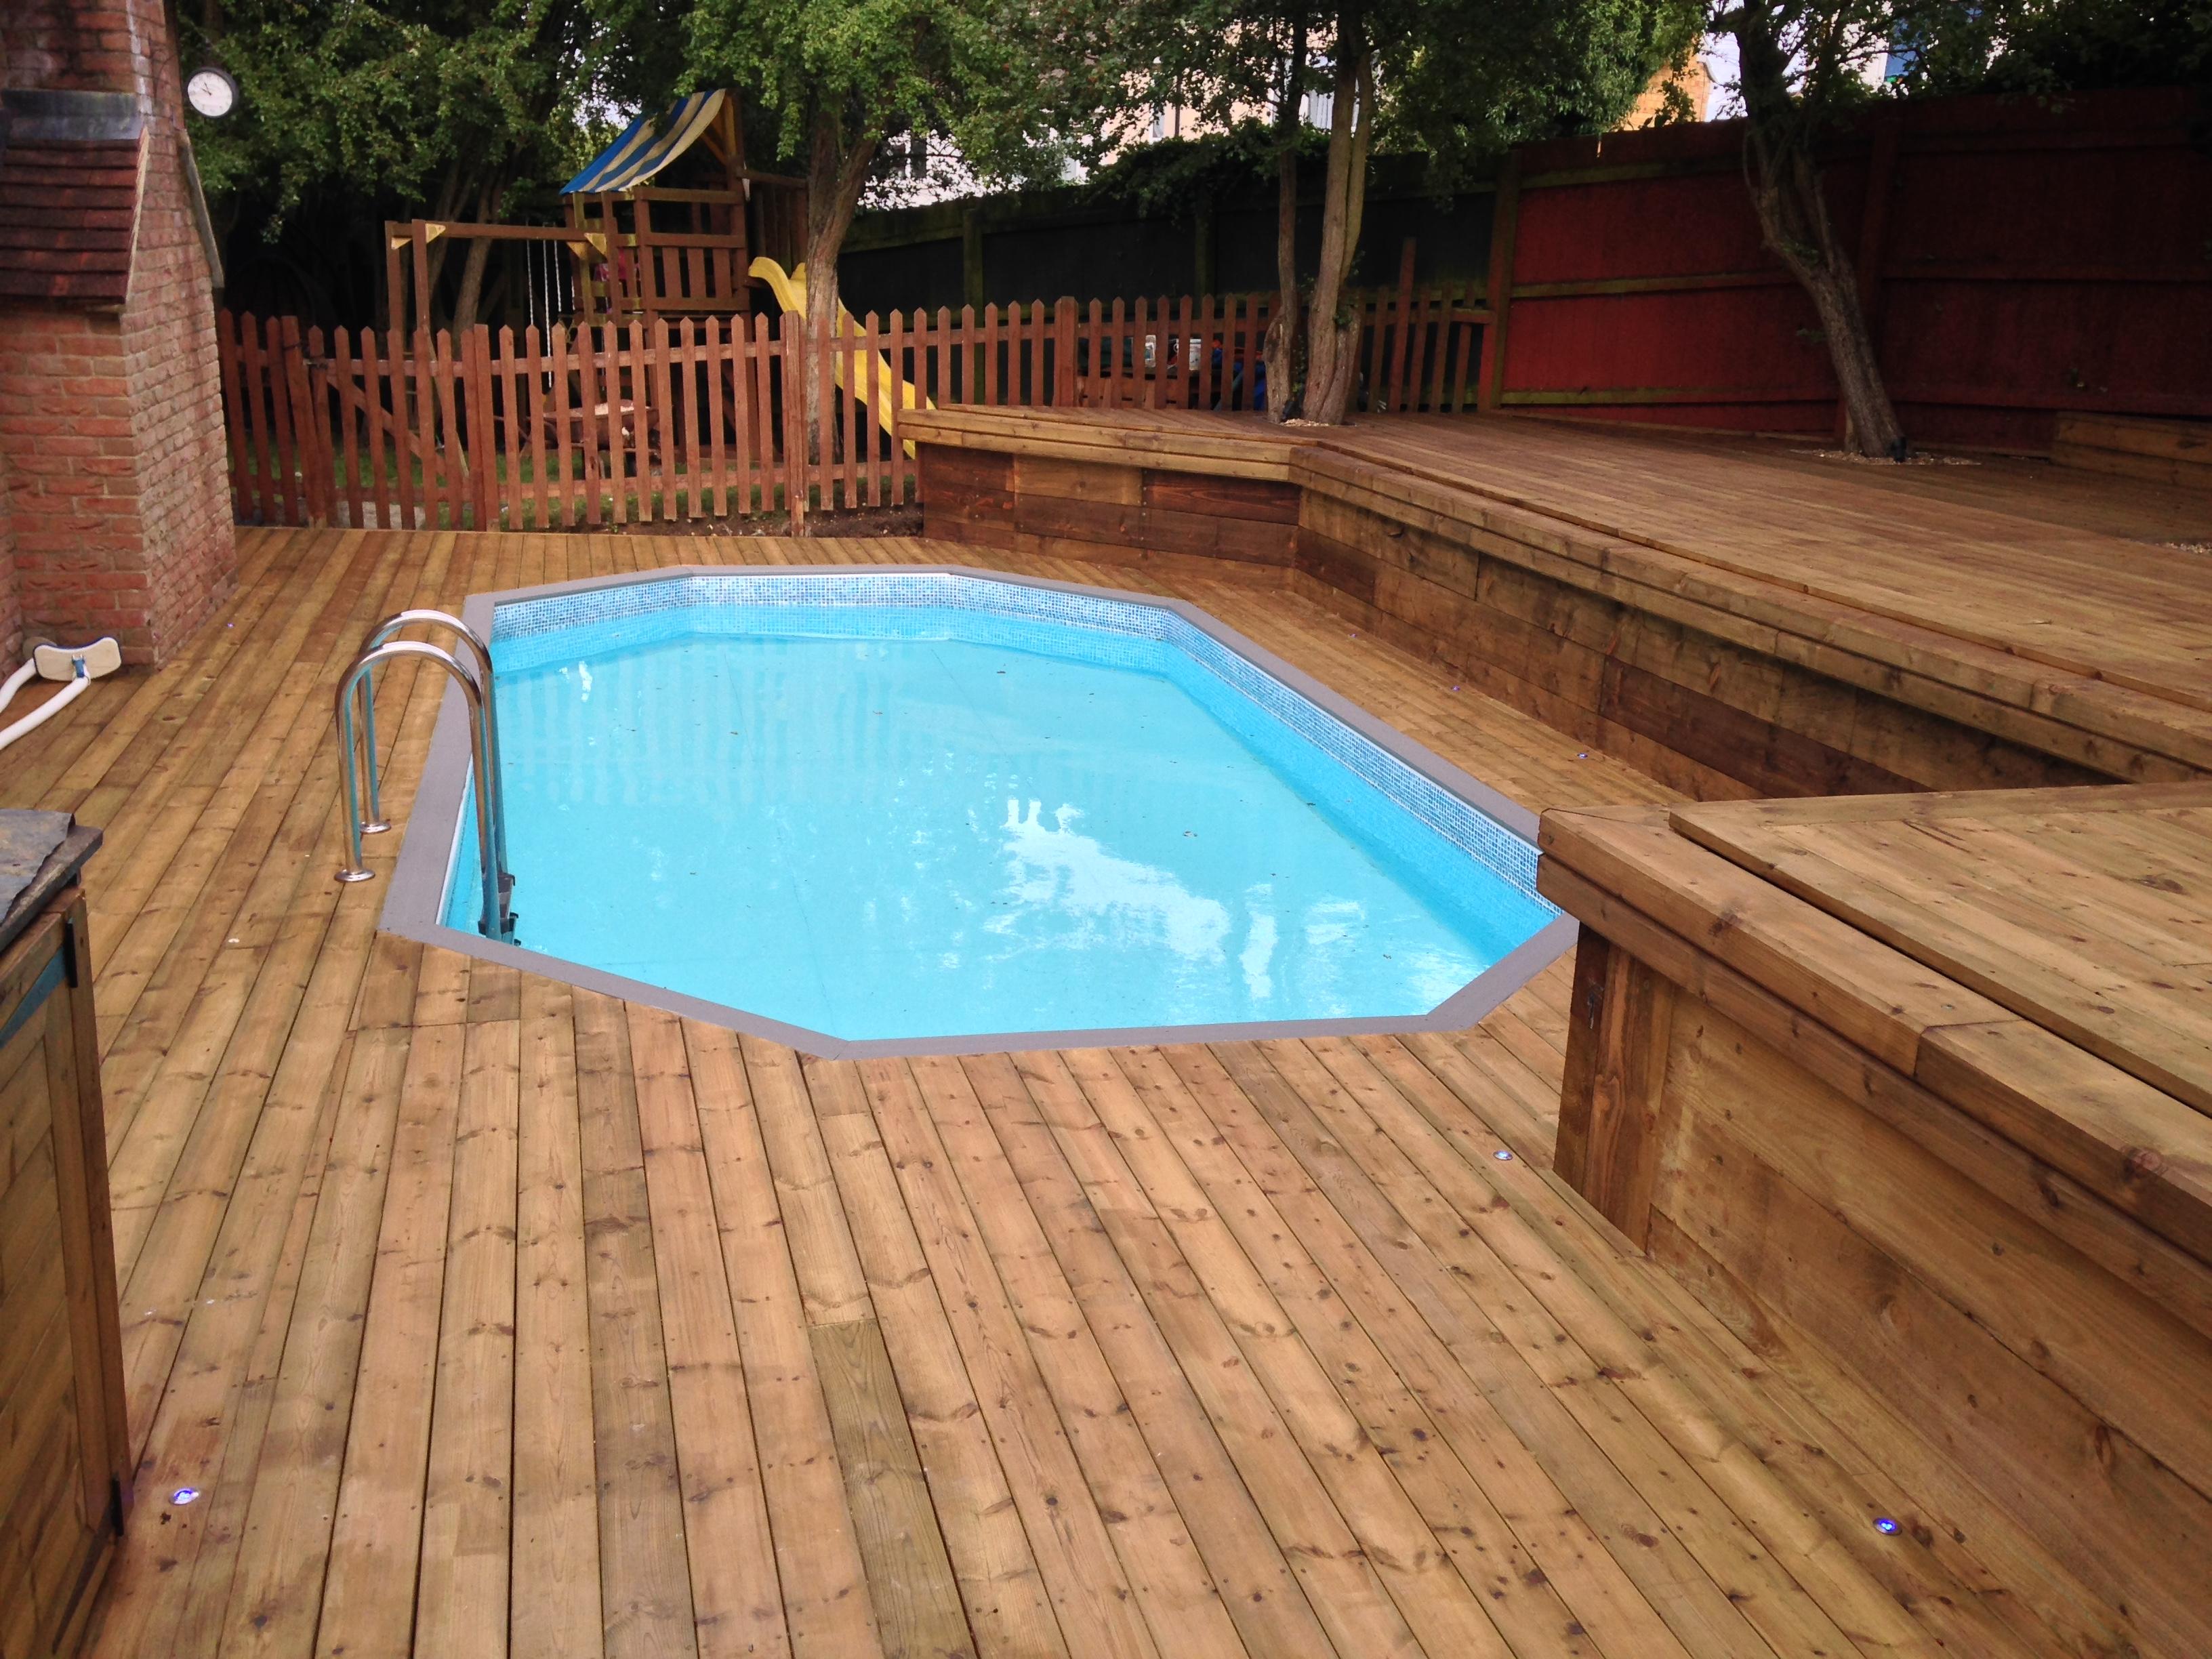 Swimming pool deck